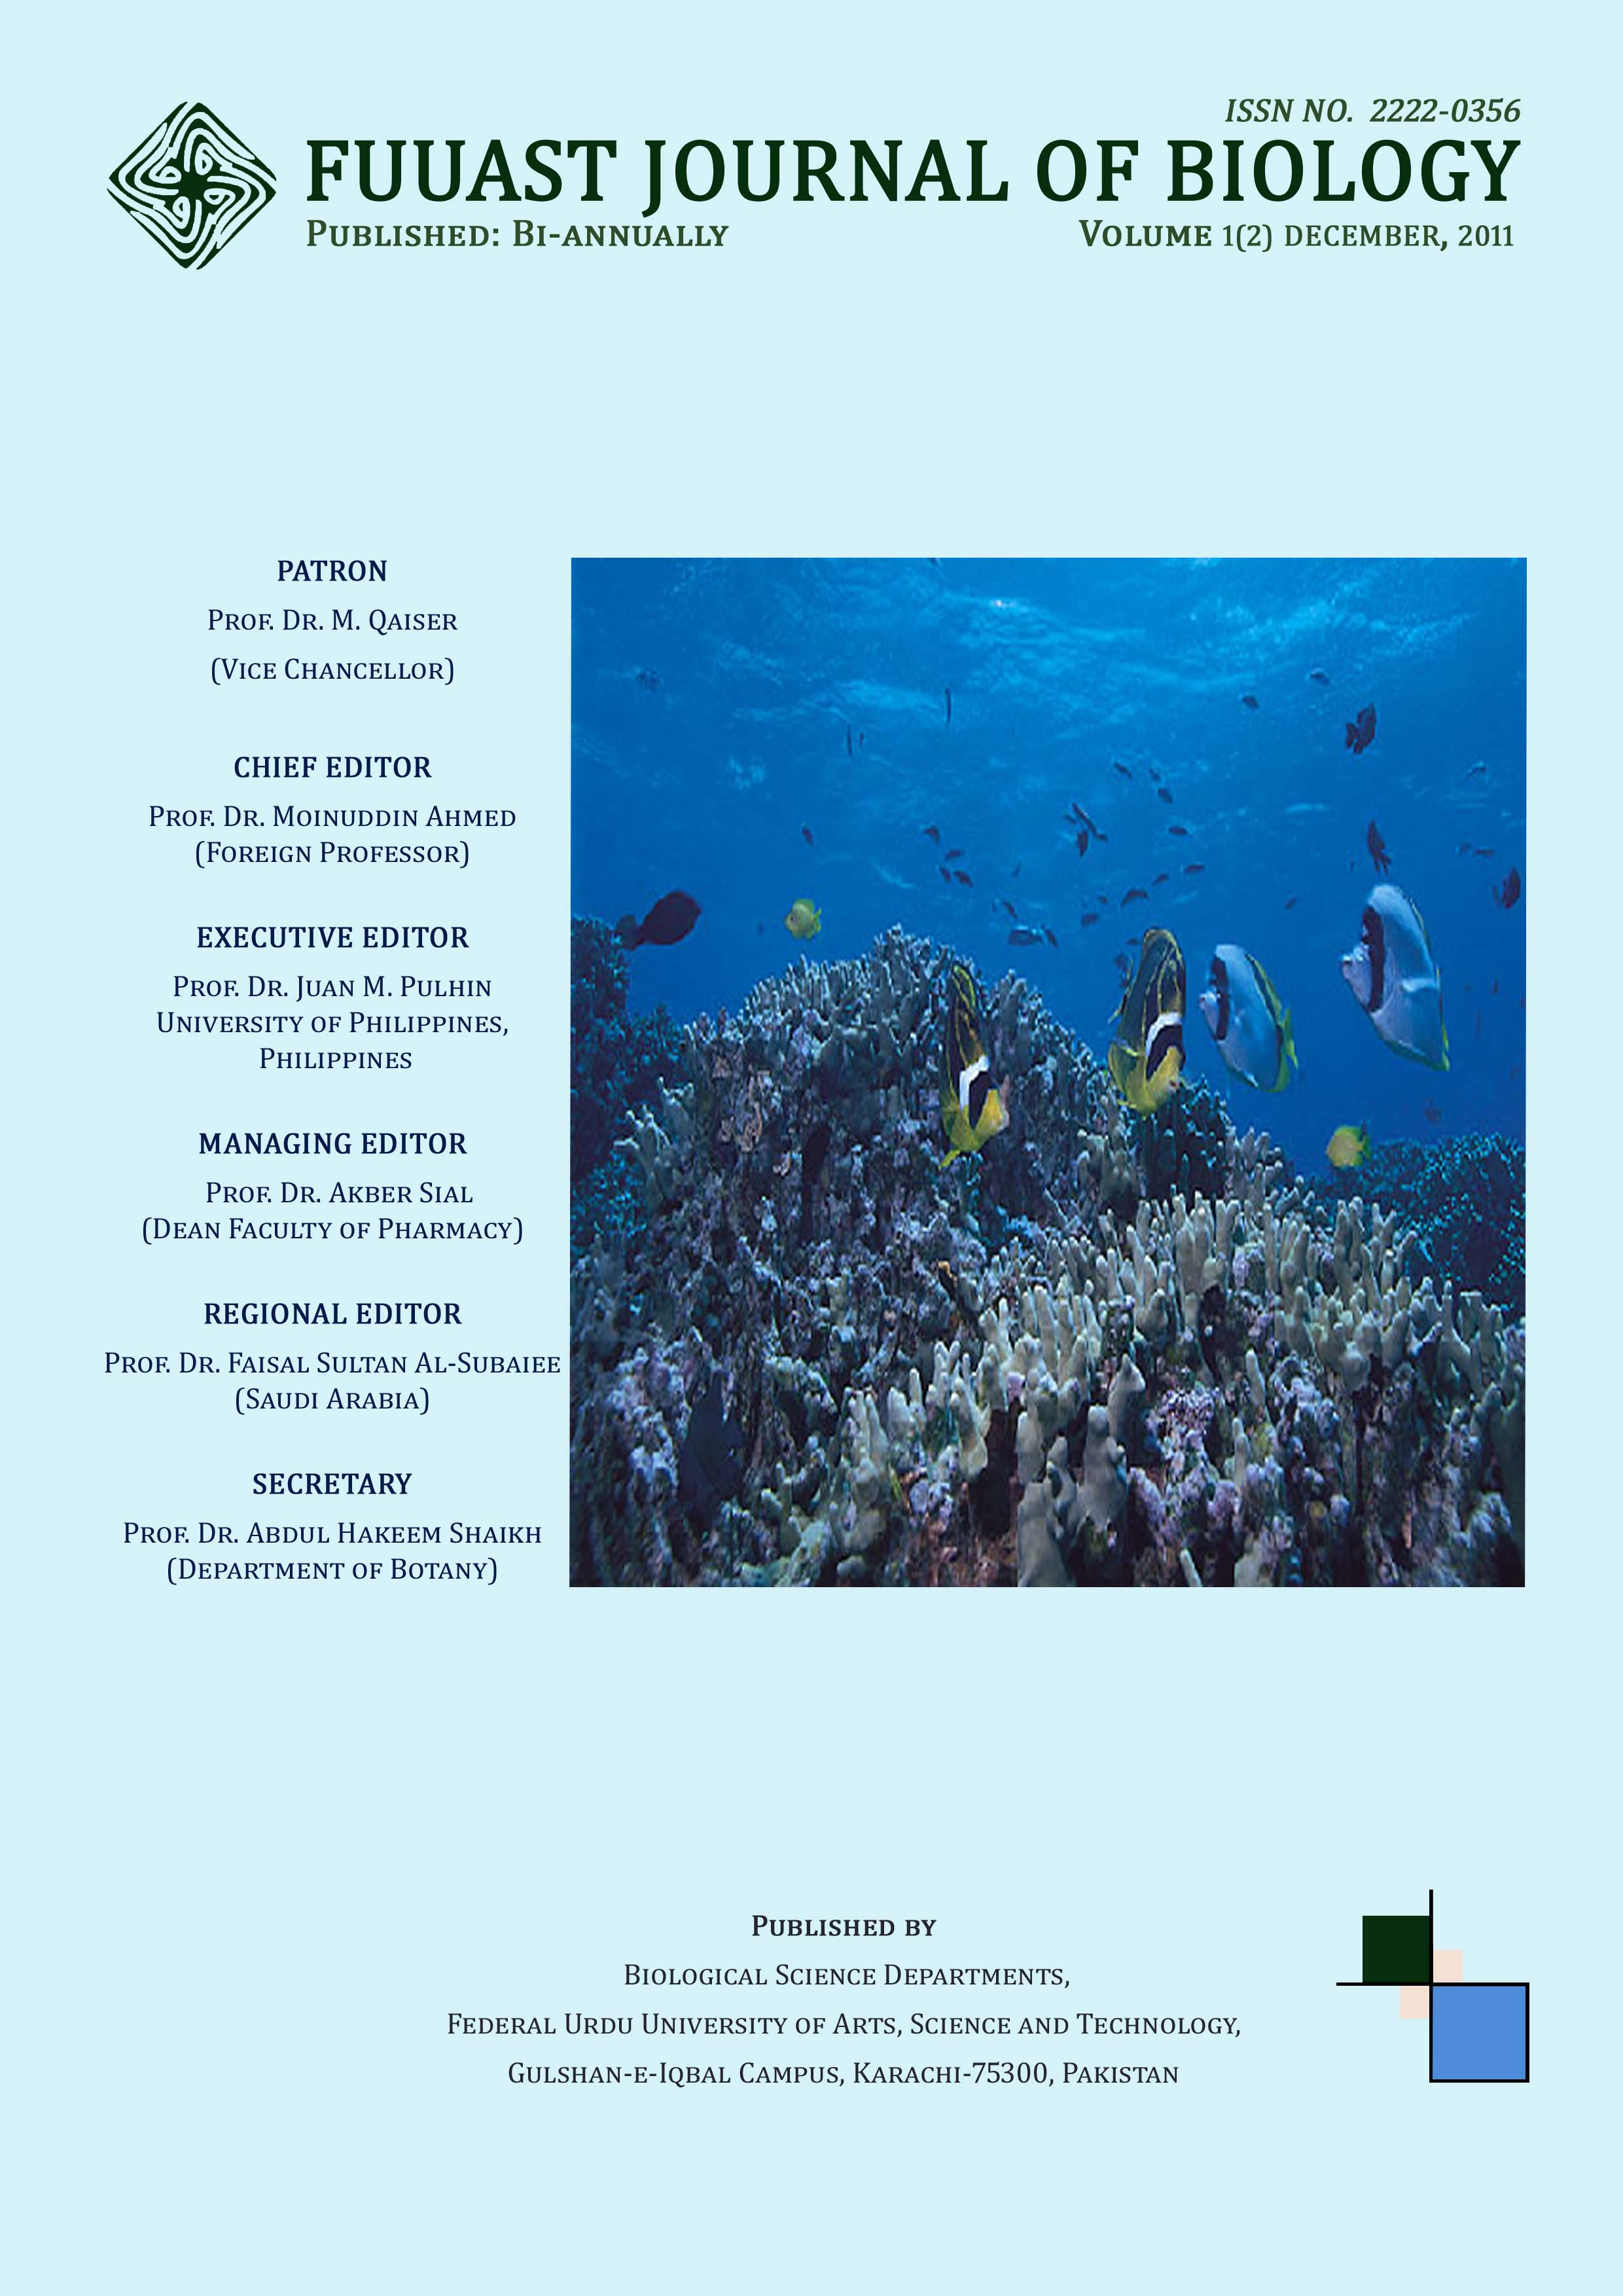 View Vol. 1 No. 2 December (2011): Fuuast Journal of Biology